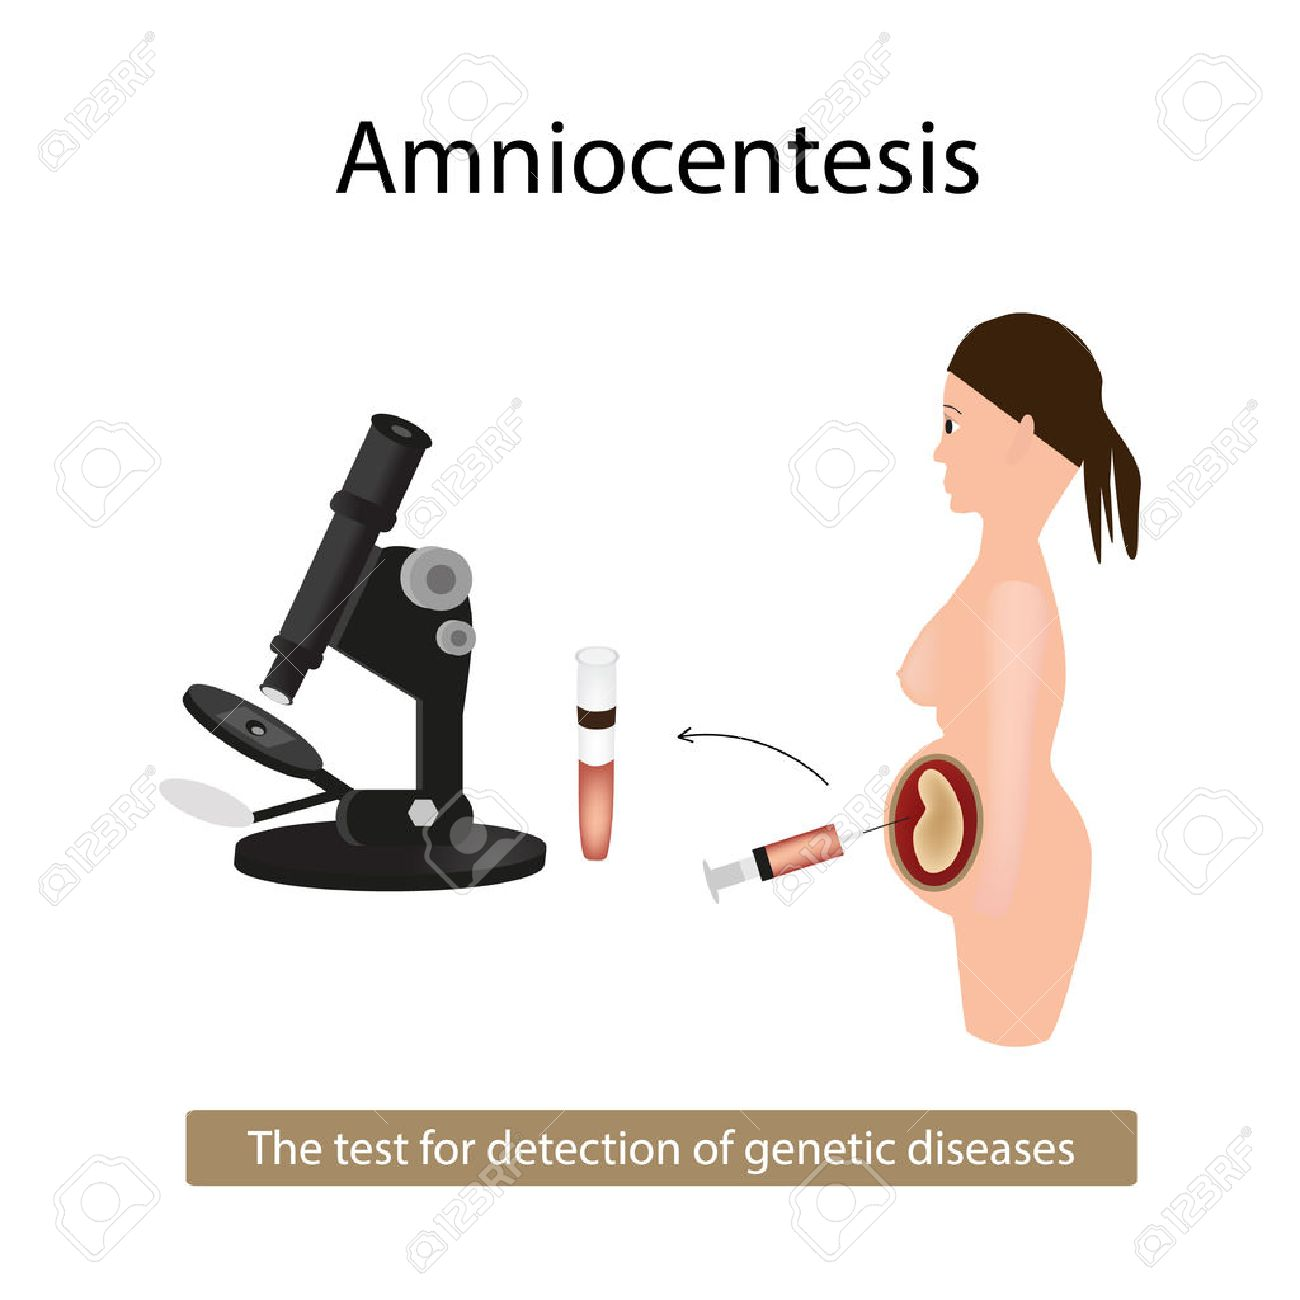 Amniocentesis. Analysis of amniotic fluid. Pregnant woman. Genetic diseases. illustration on isolated background. - 54267259